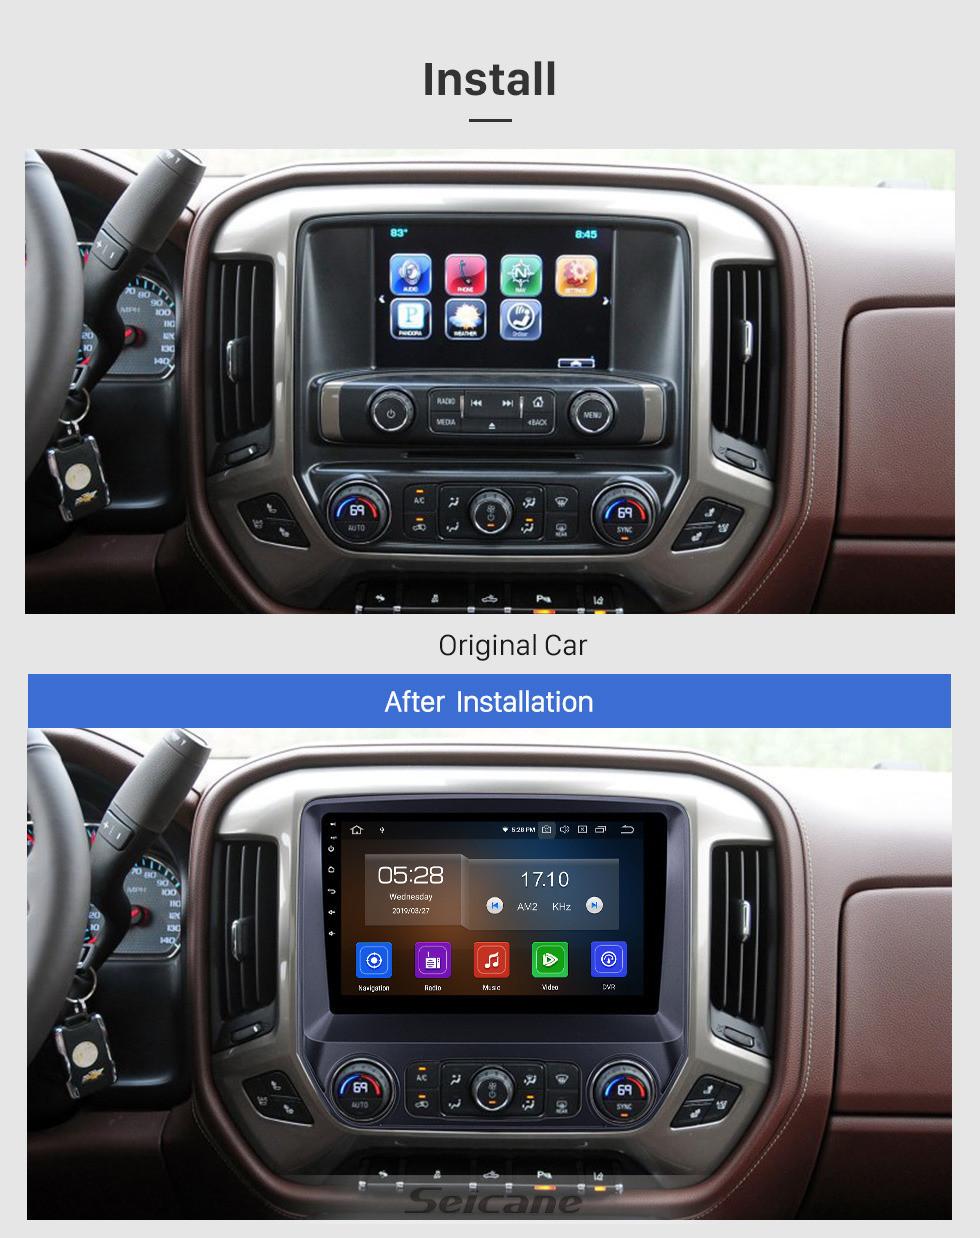 Seicane 2014-2018 Chevy Chevrolet Silverado 10.1 inch Bleutooth Radio Android 10.0 GPS Navi HD Touchscreen Carplay Stereo support DVR DVD Player 4G WIFI